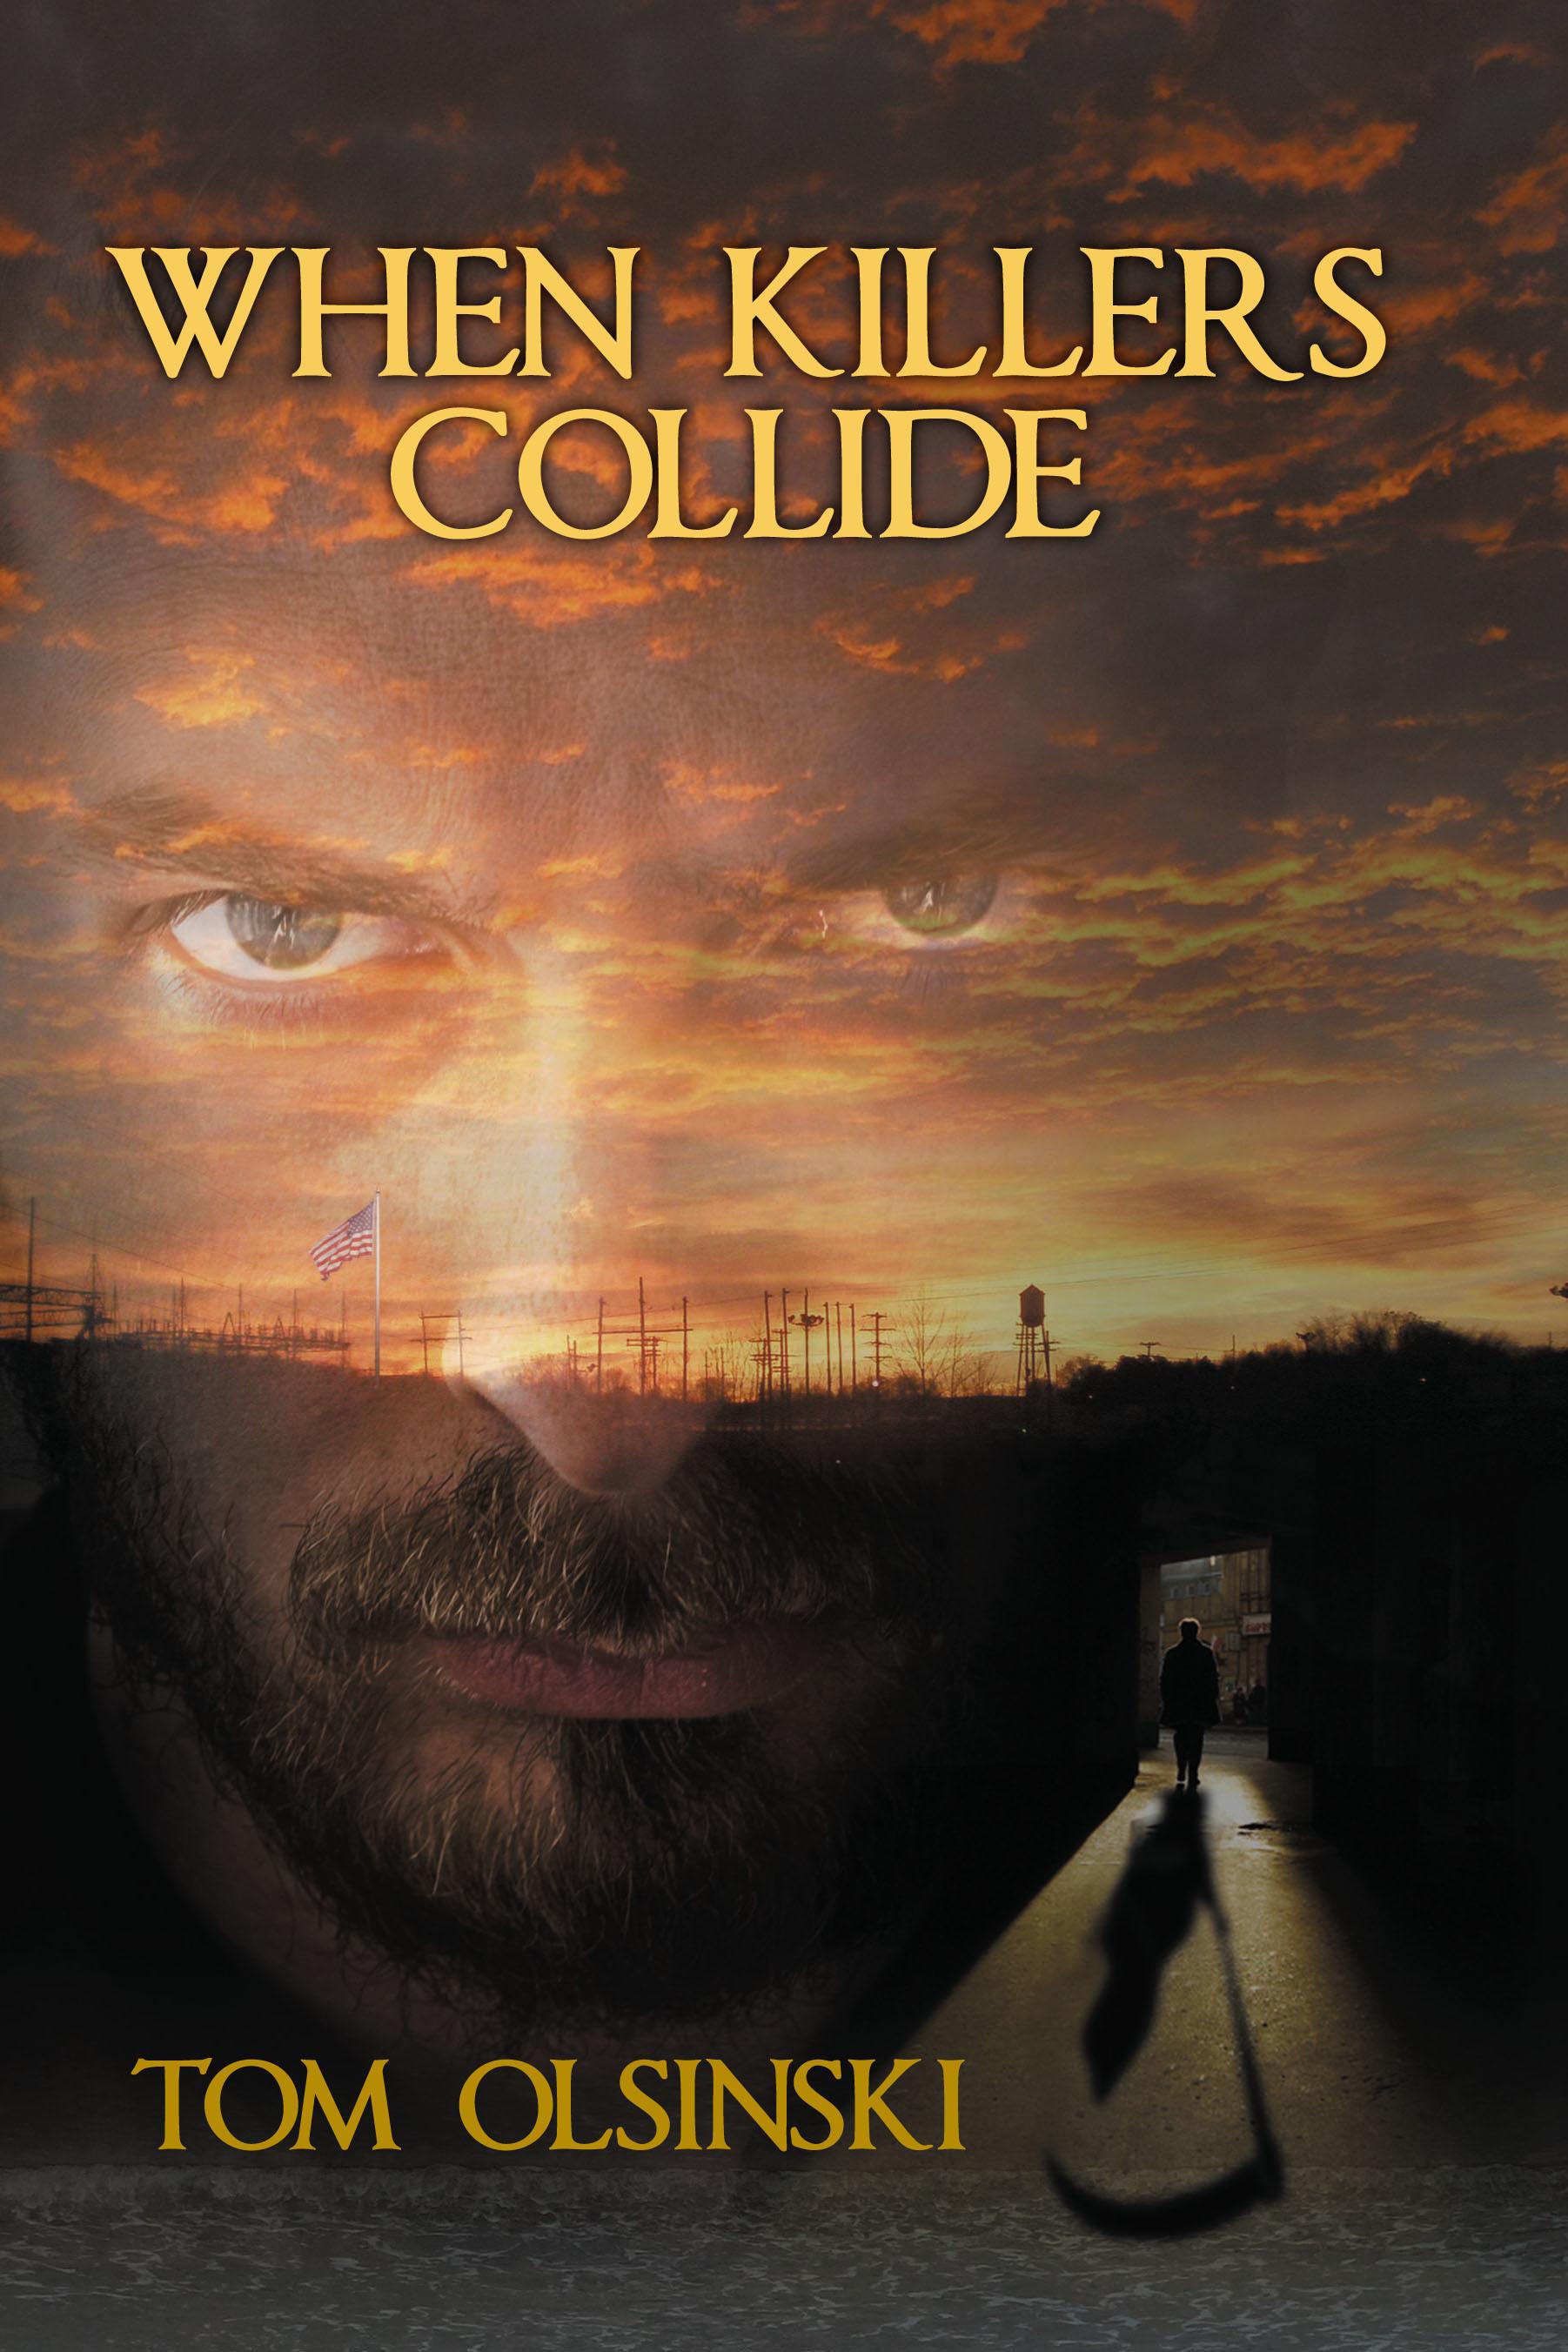 When Killers Collide  by  Tom Olsinski